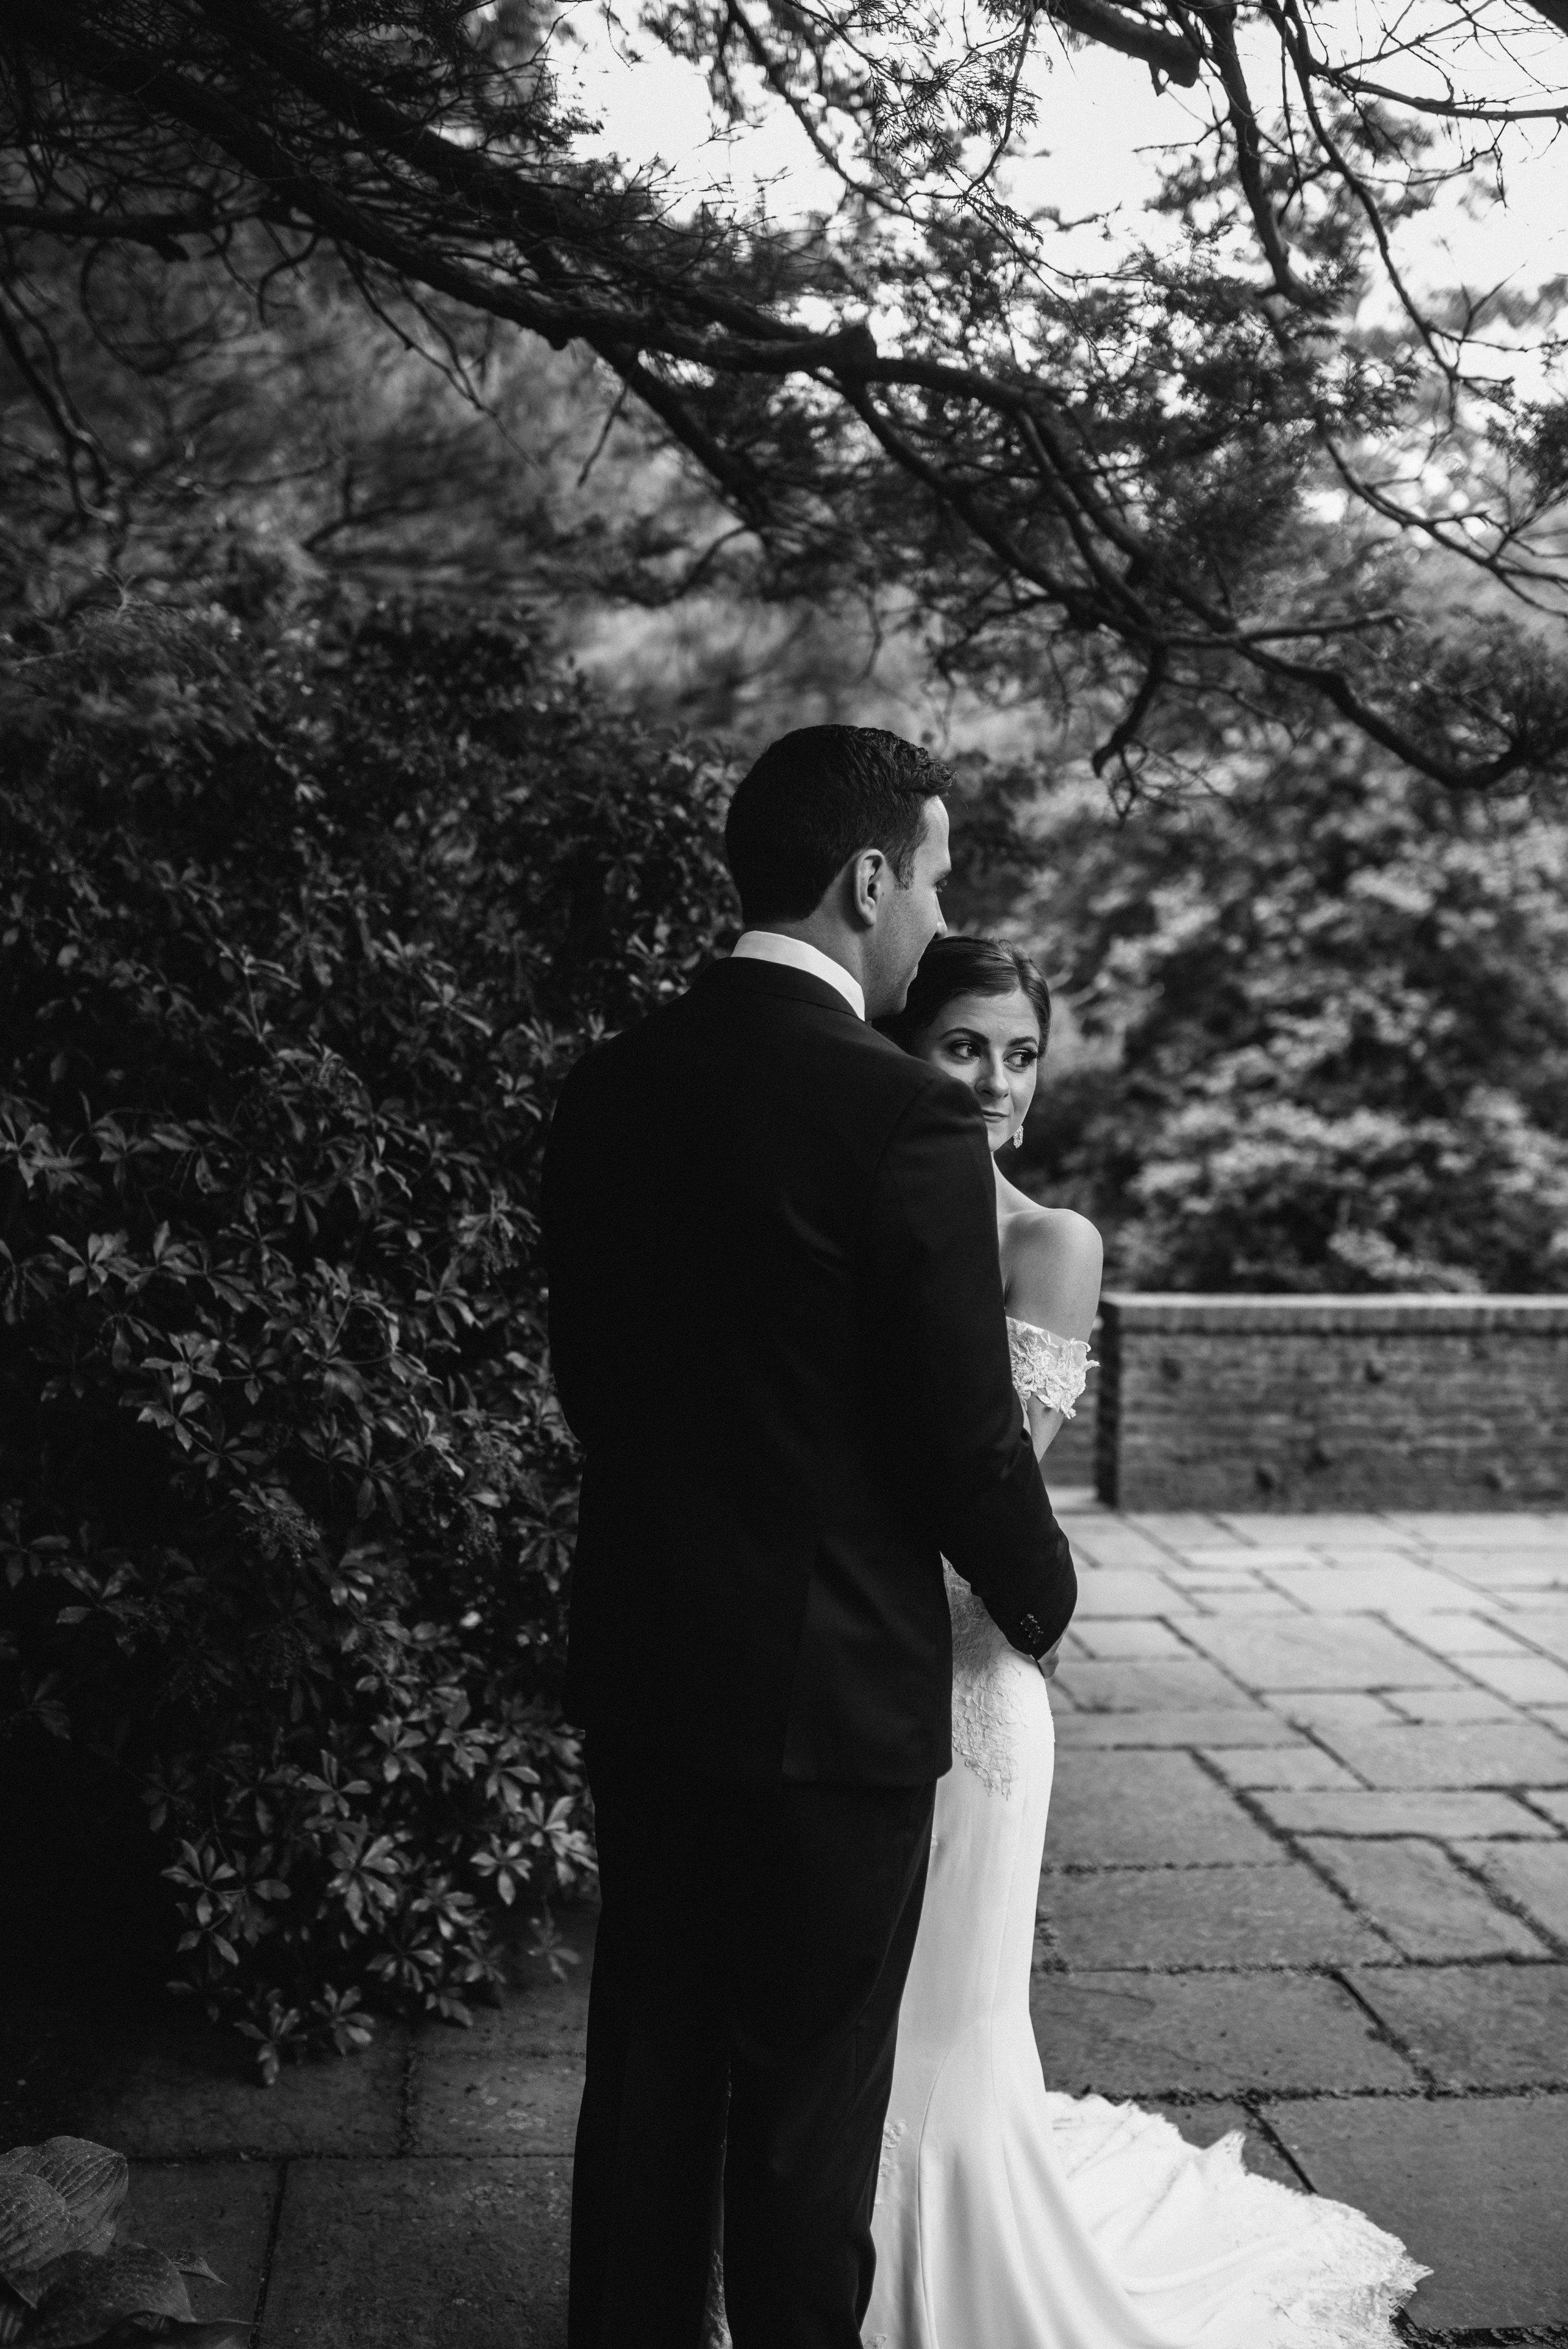 agpcollective_daniellebrett_coupleportraits-9478.jpg